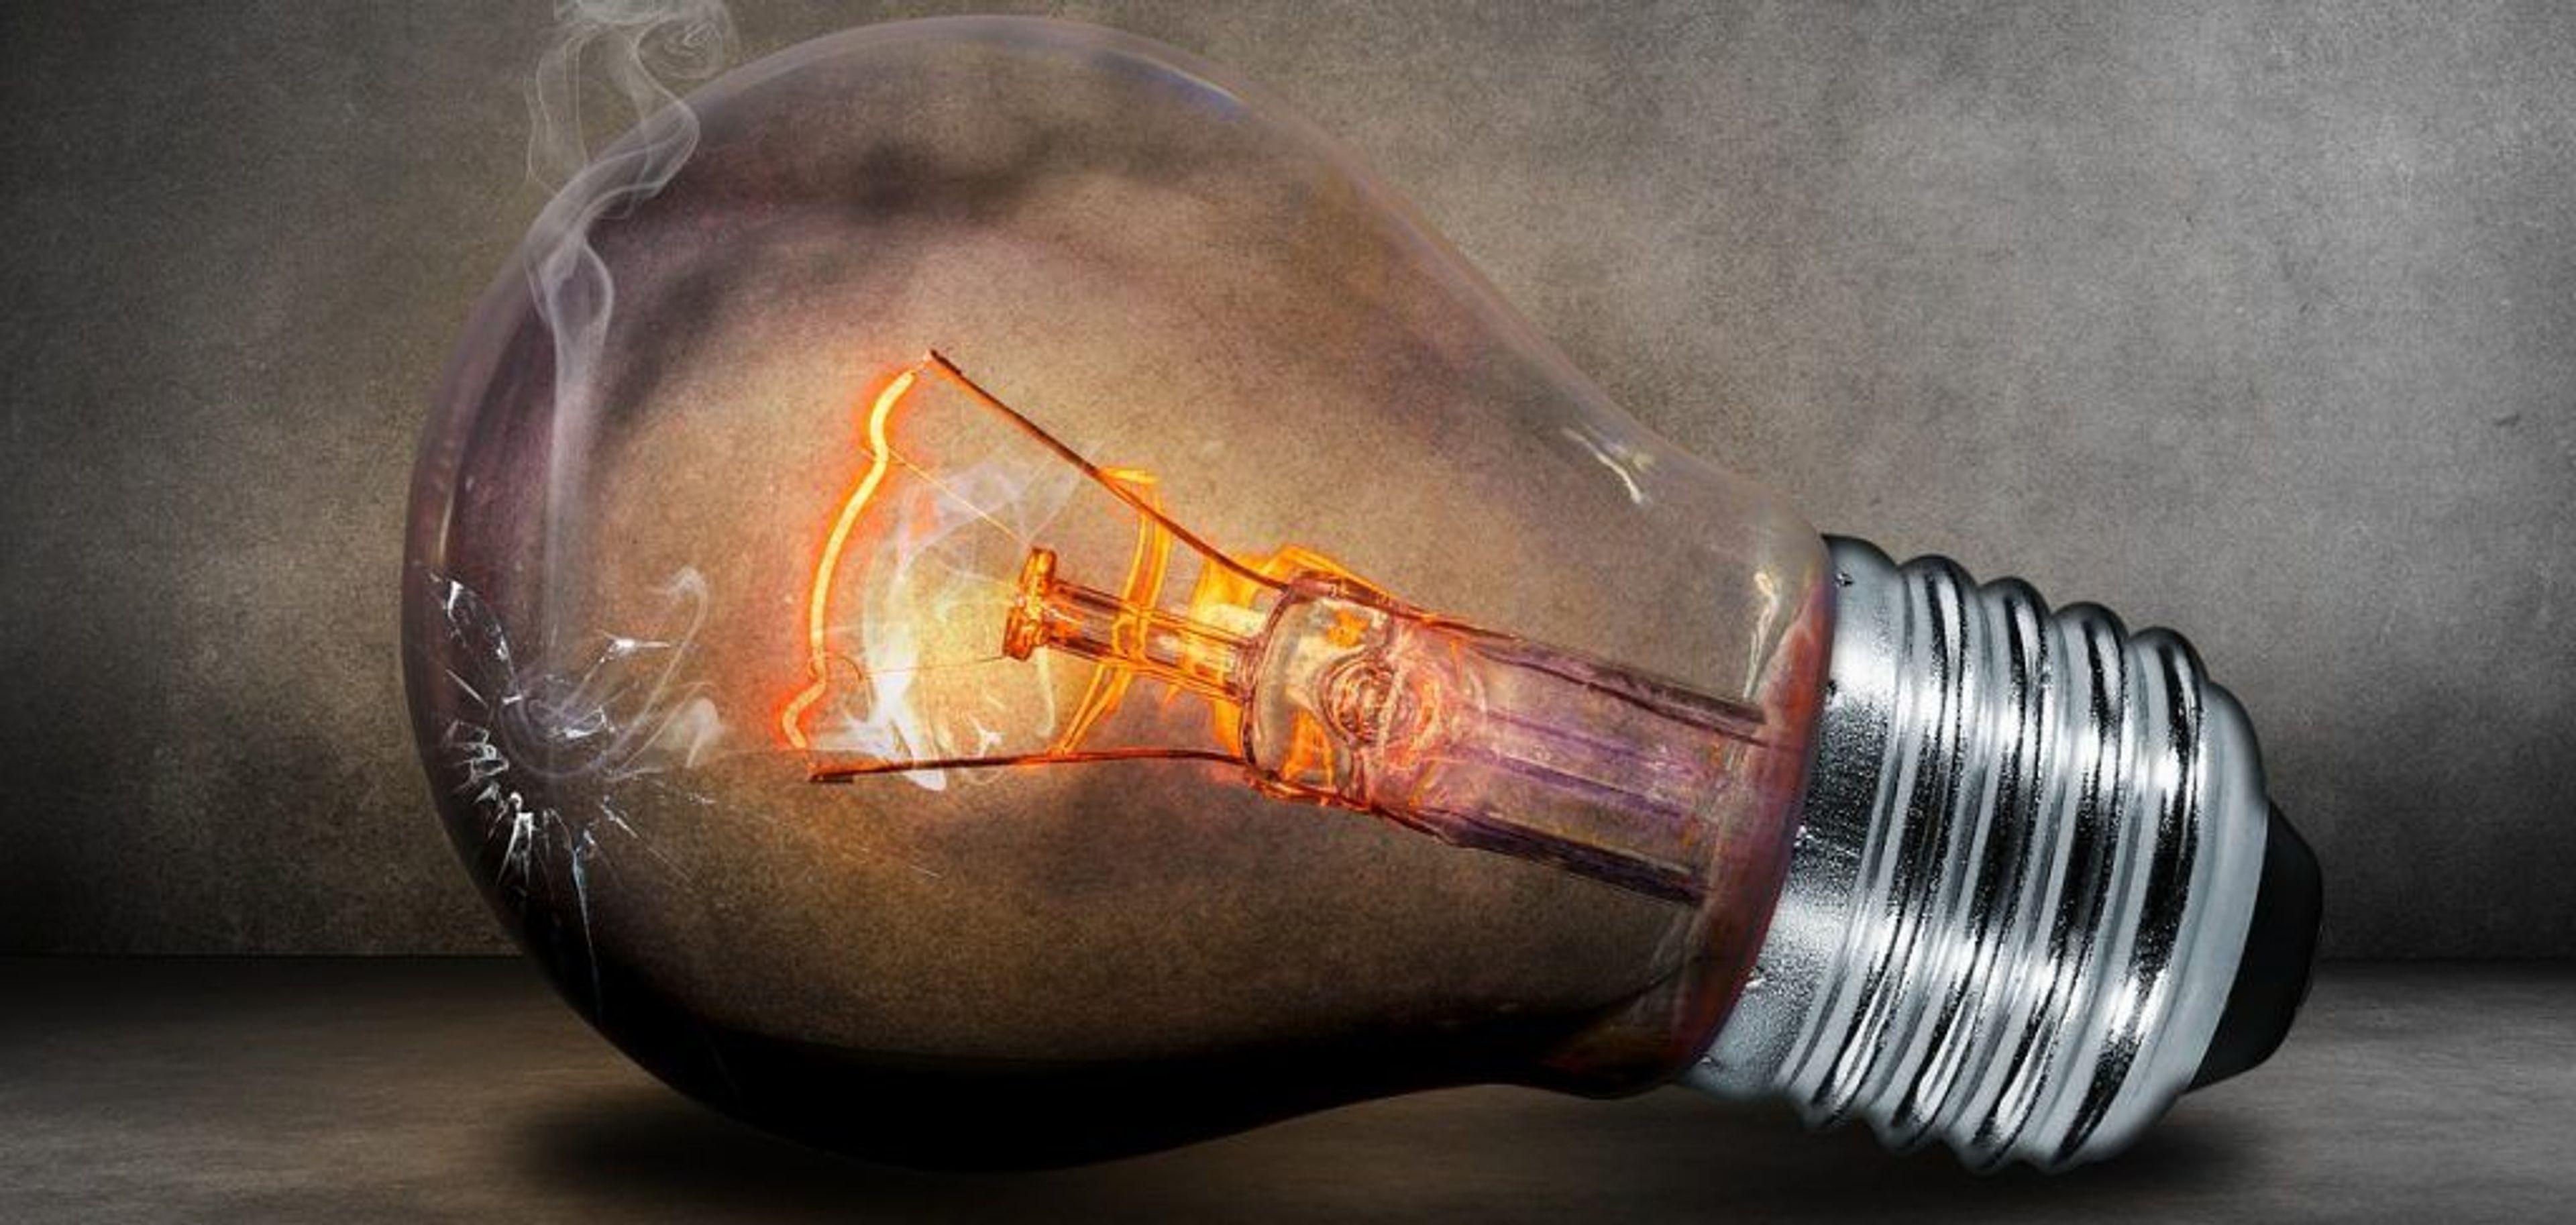 A lightbulb burning out